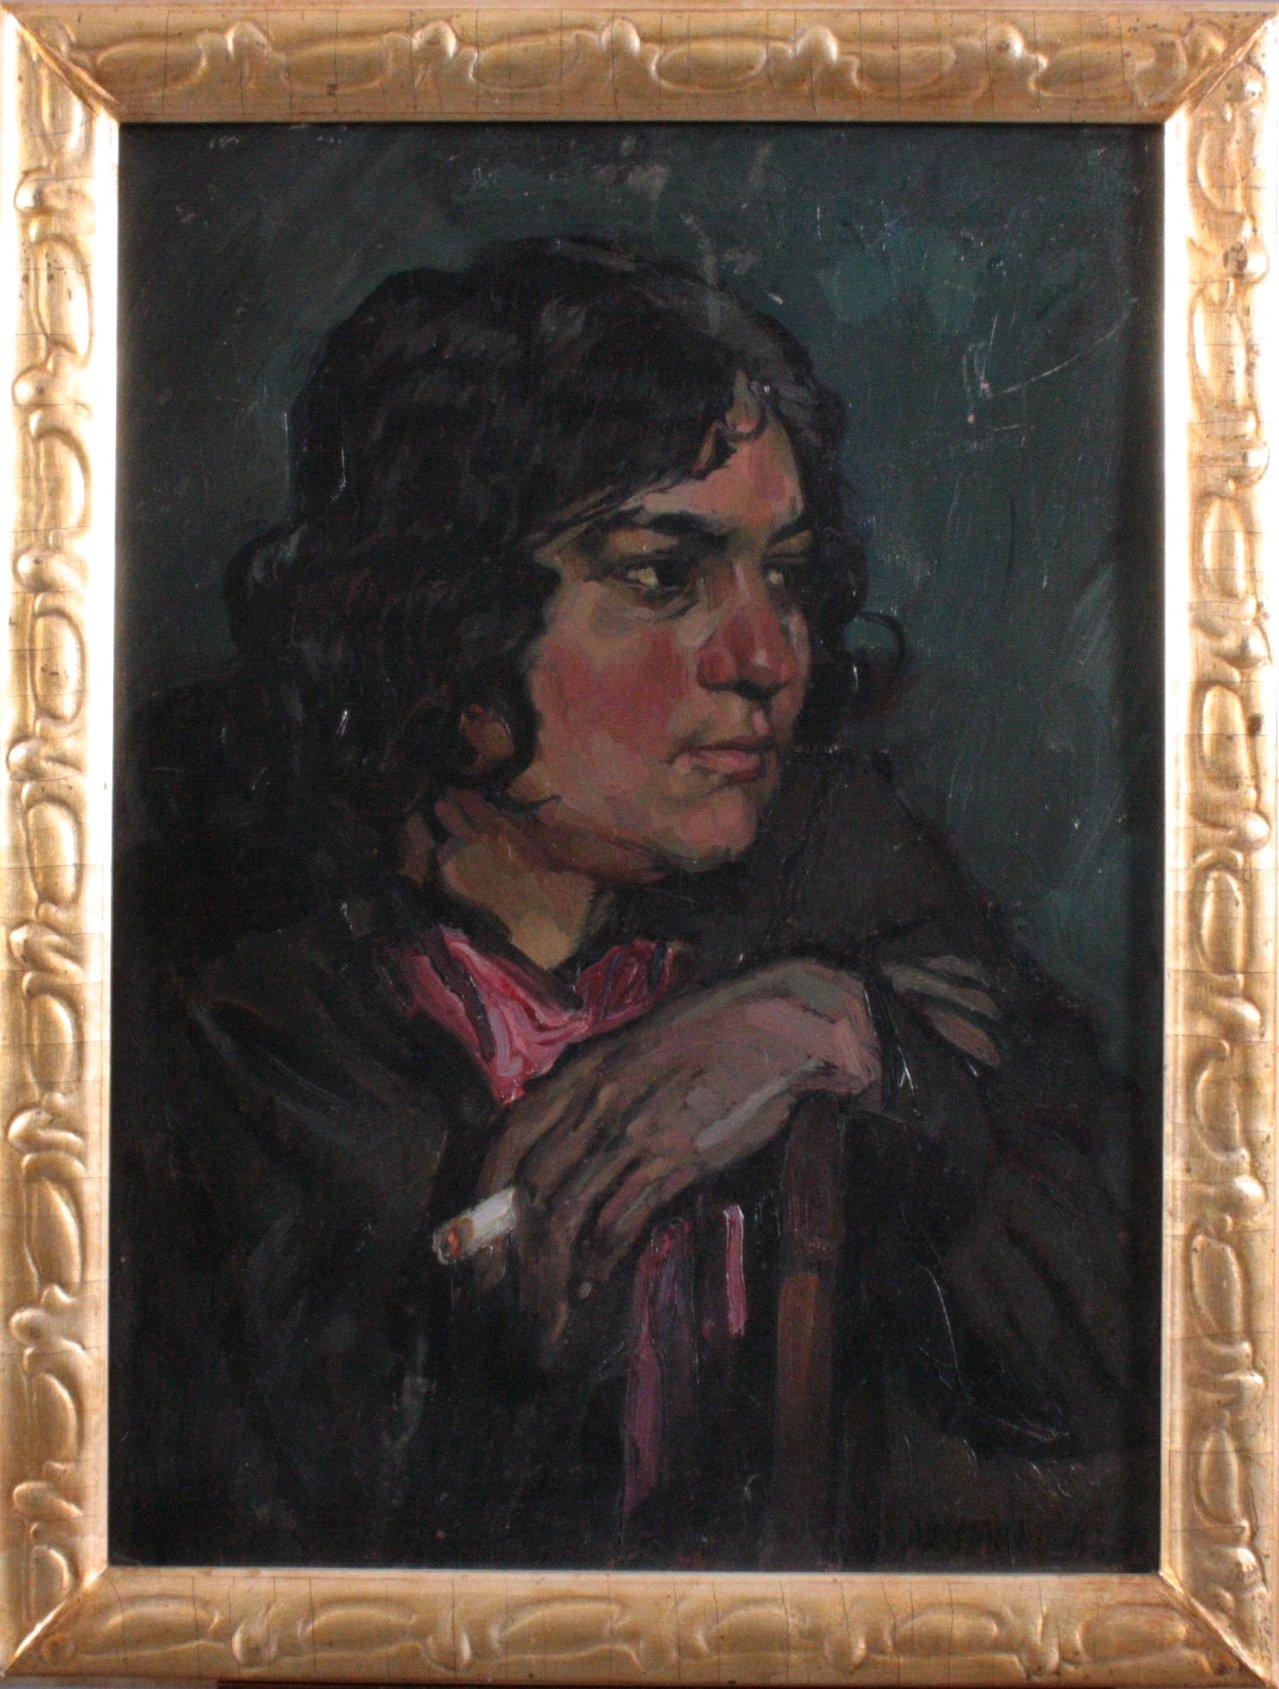 Hans Adolf Müller 1888-1934, Damenportrait mit Zigarette